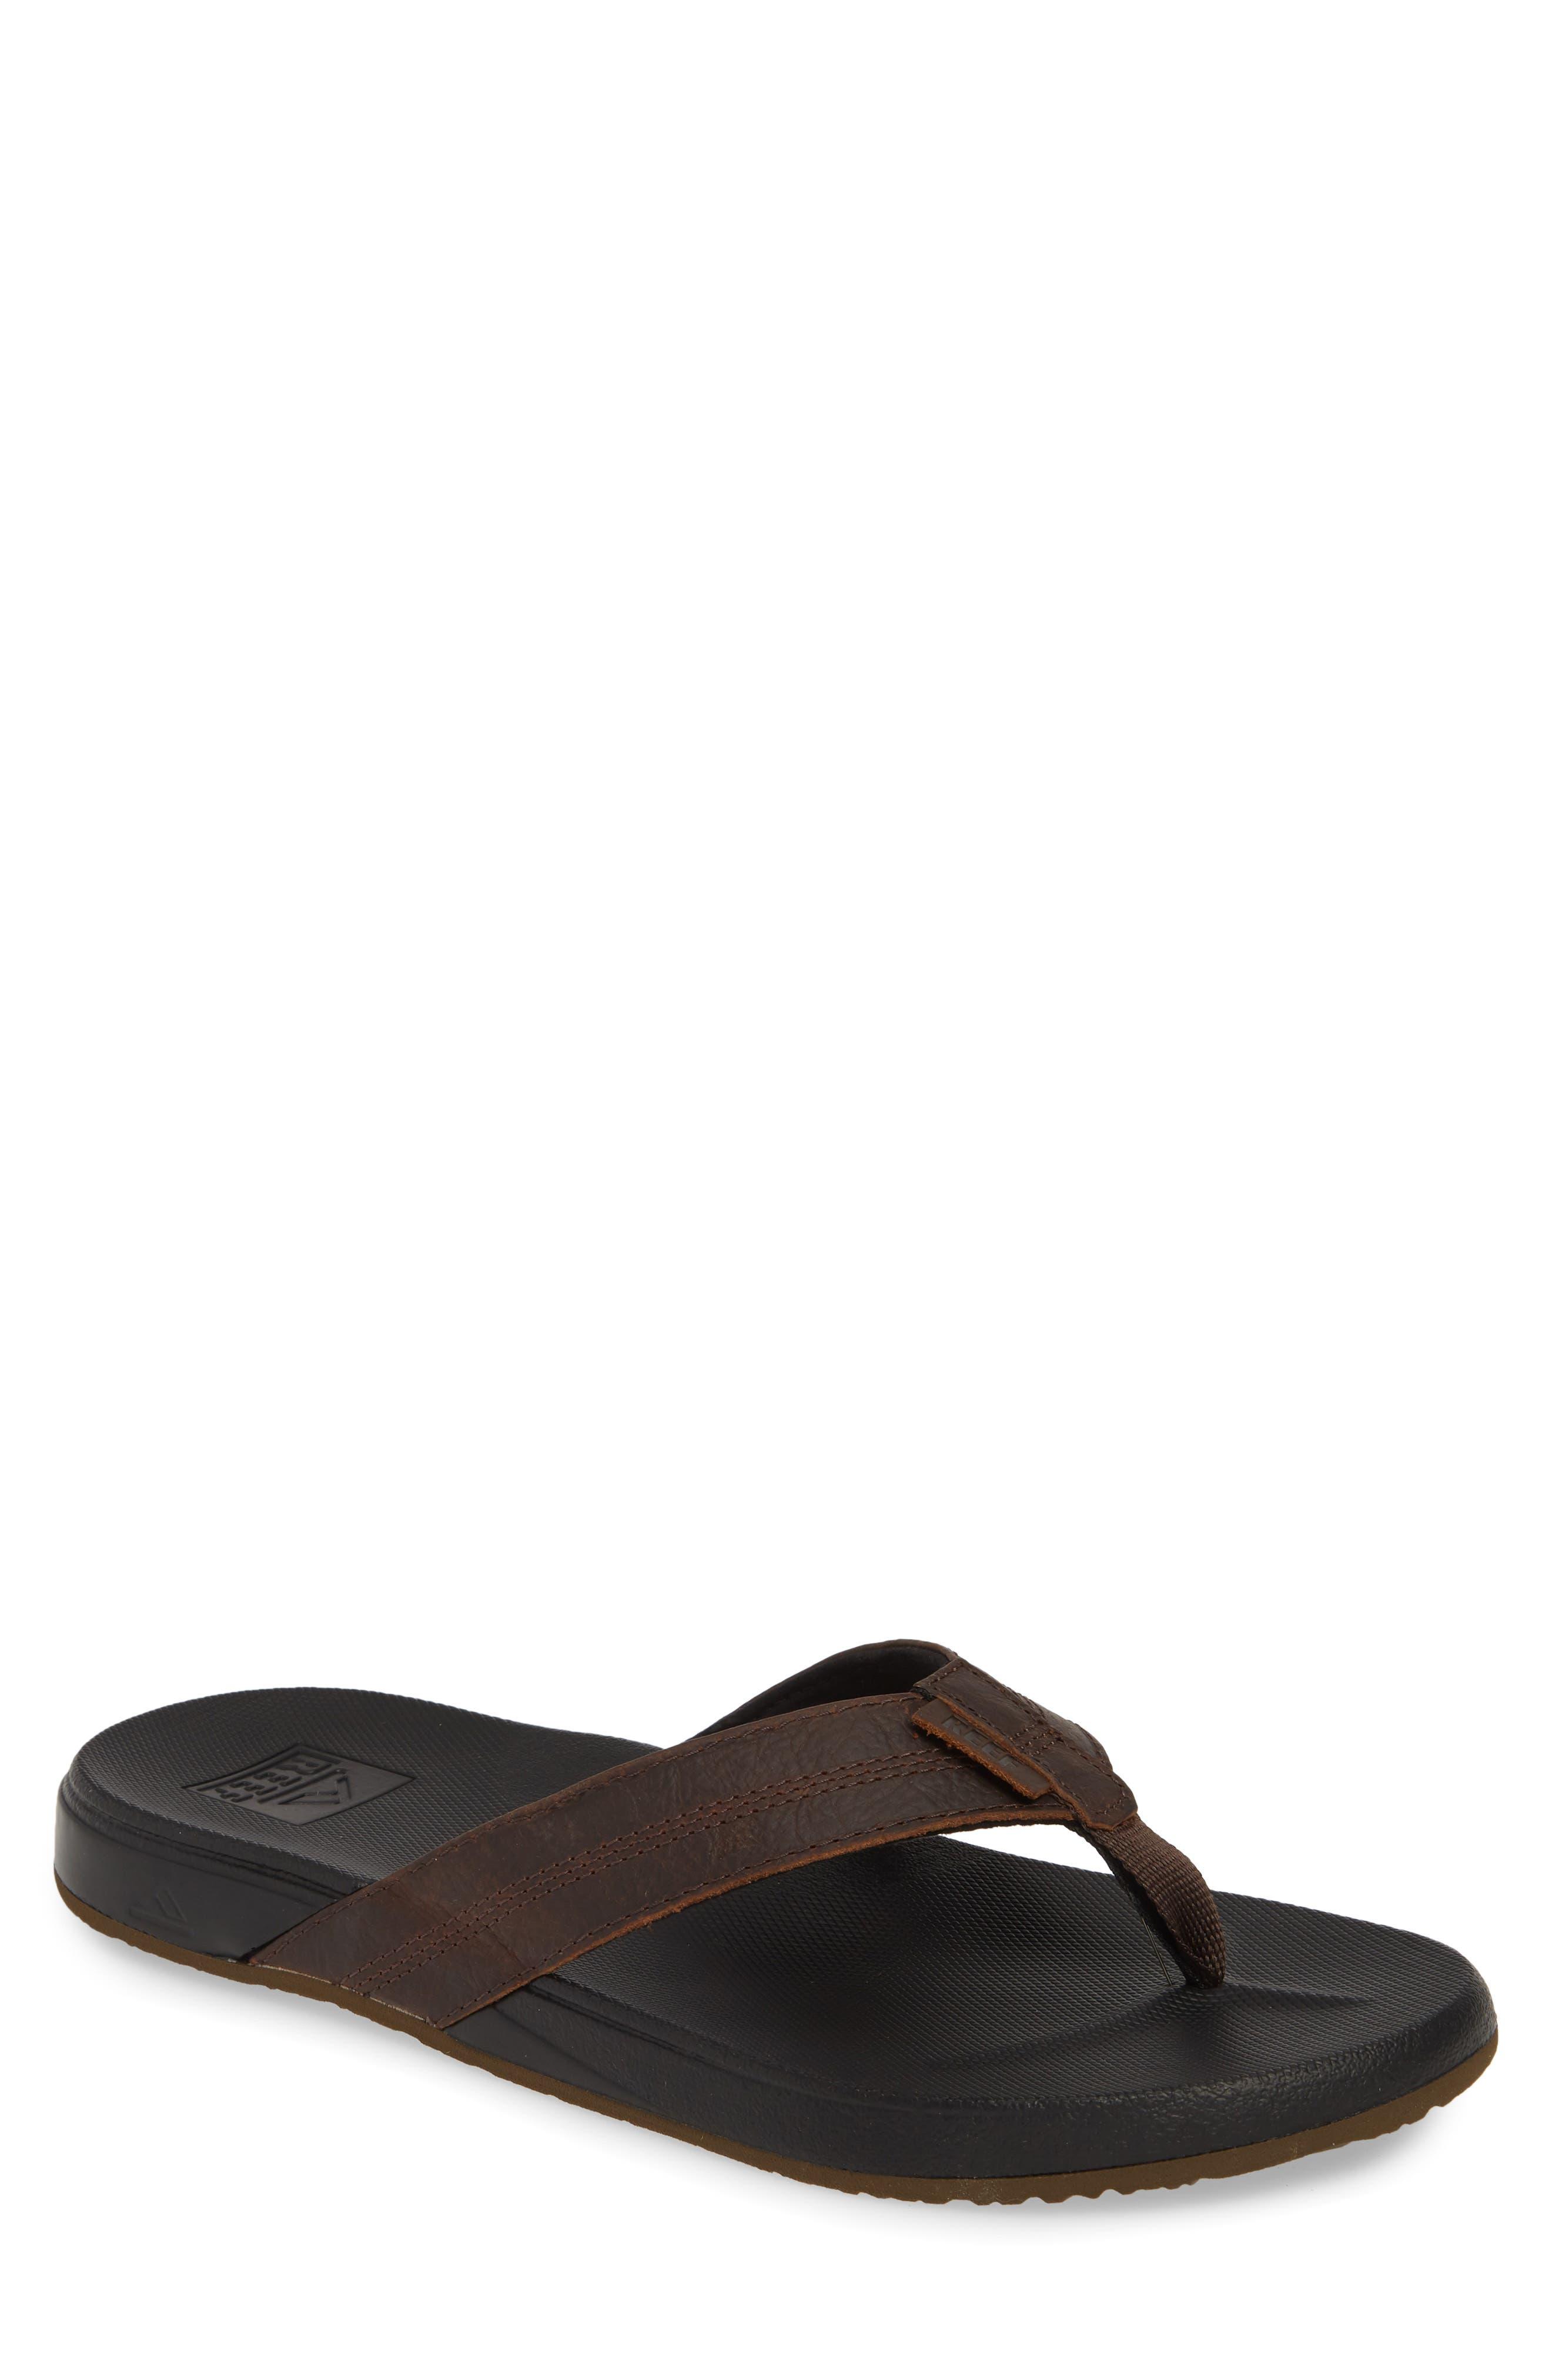 961423ab1dce Men s Reef Sandals